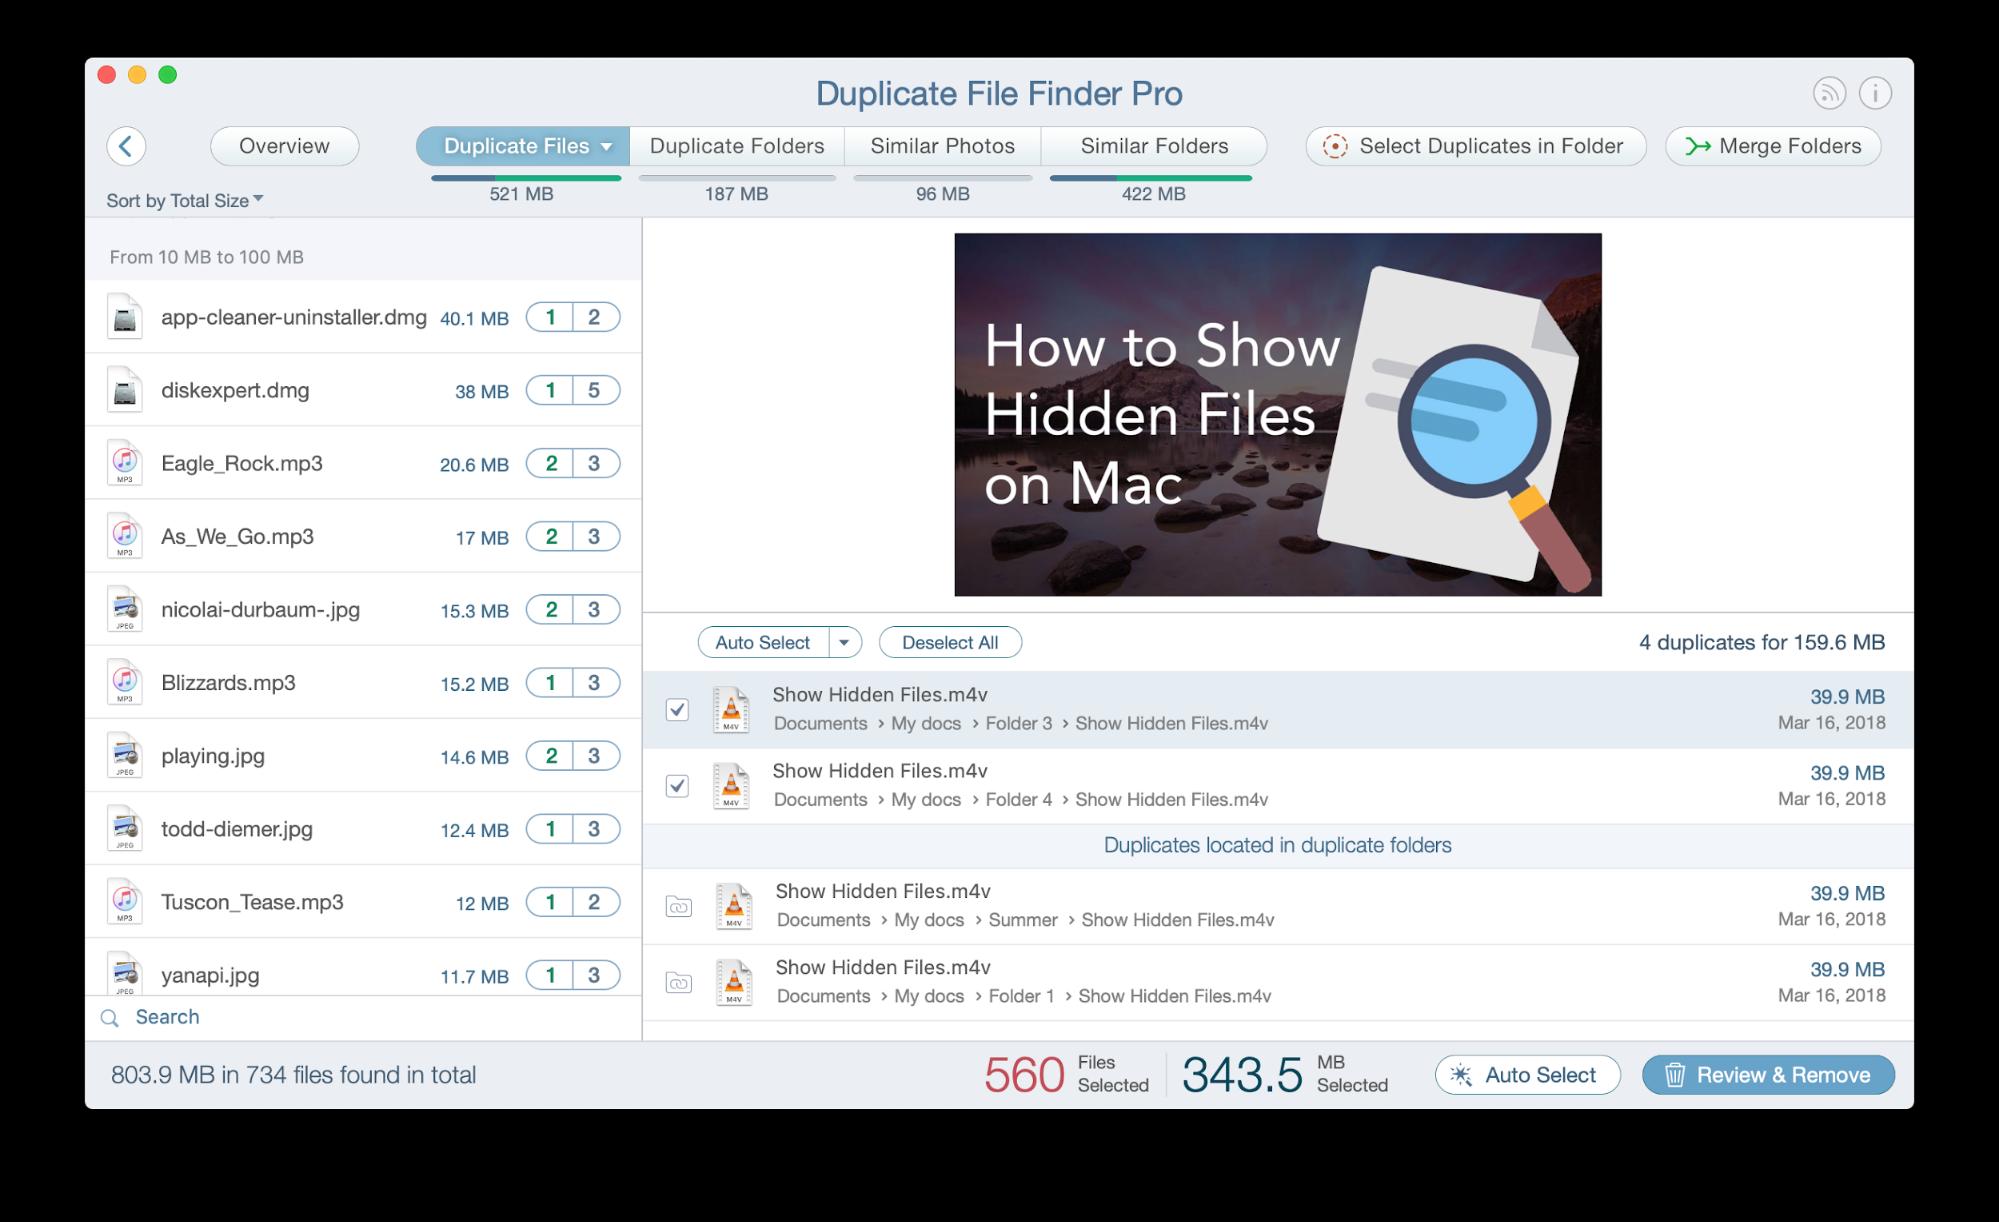 autoselect duplicate files